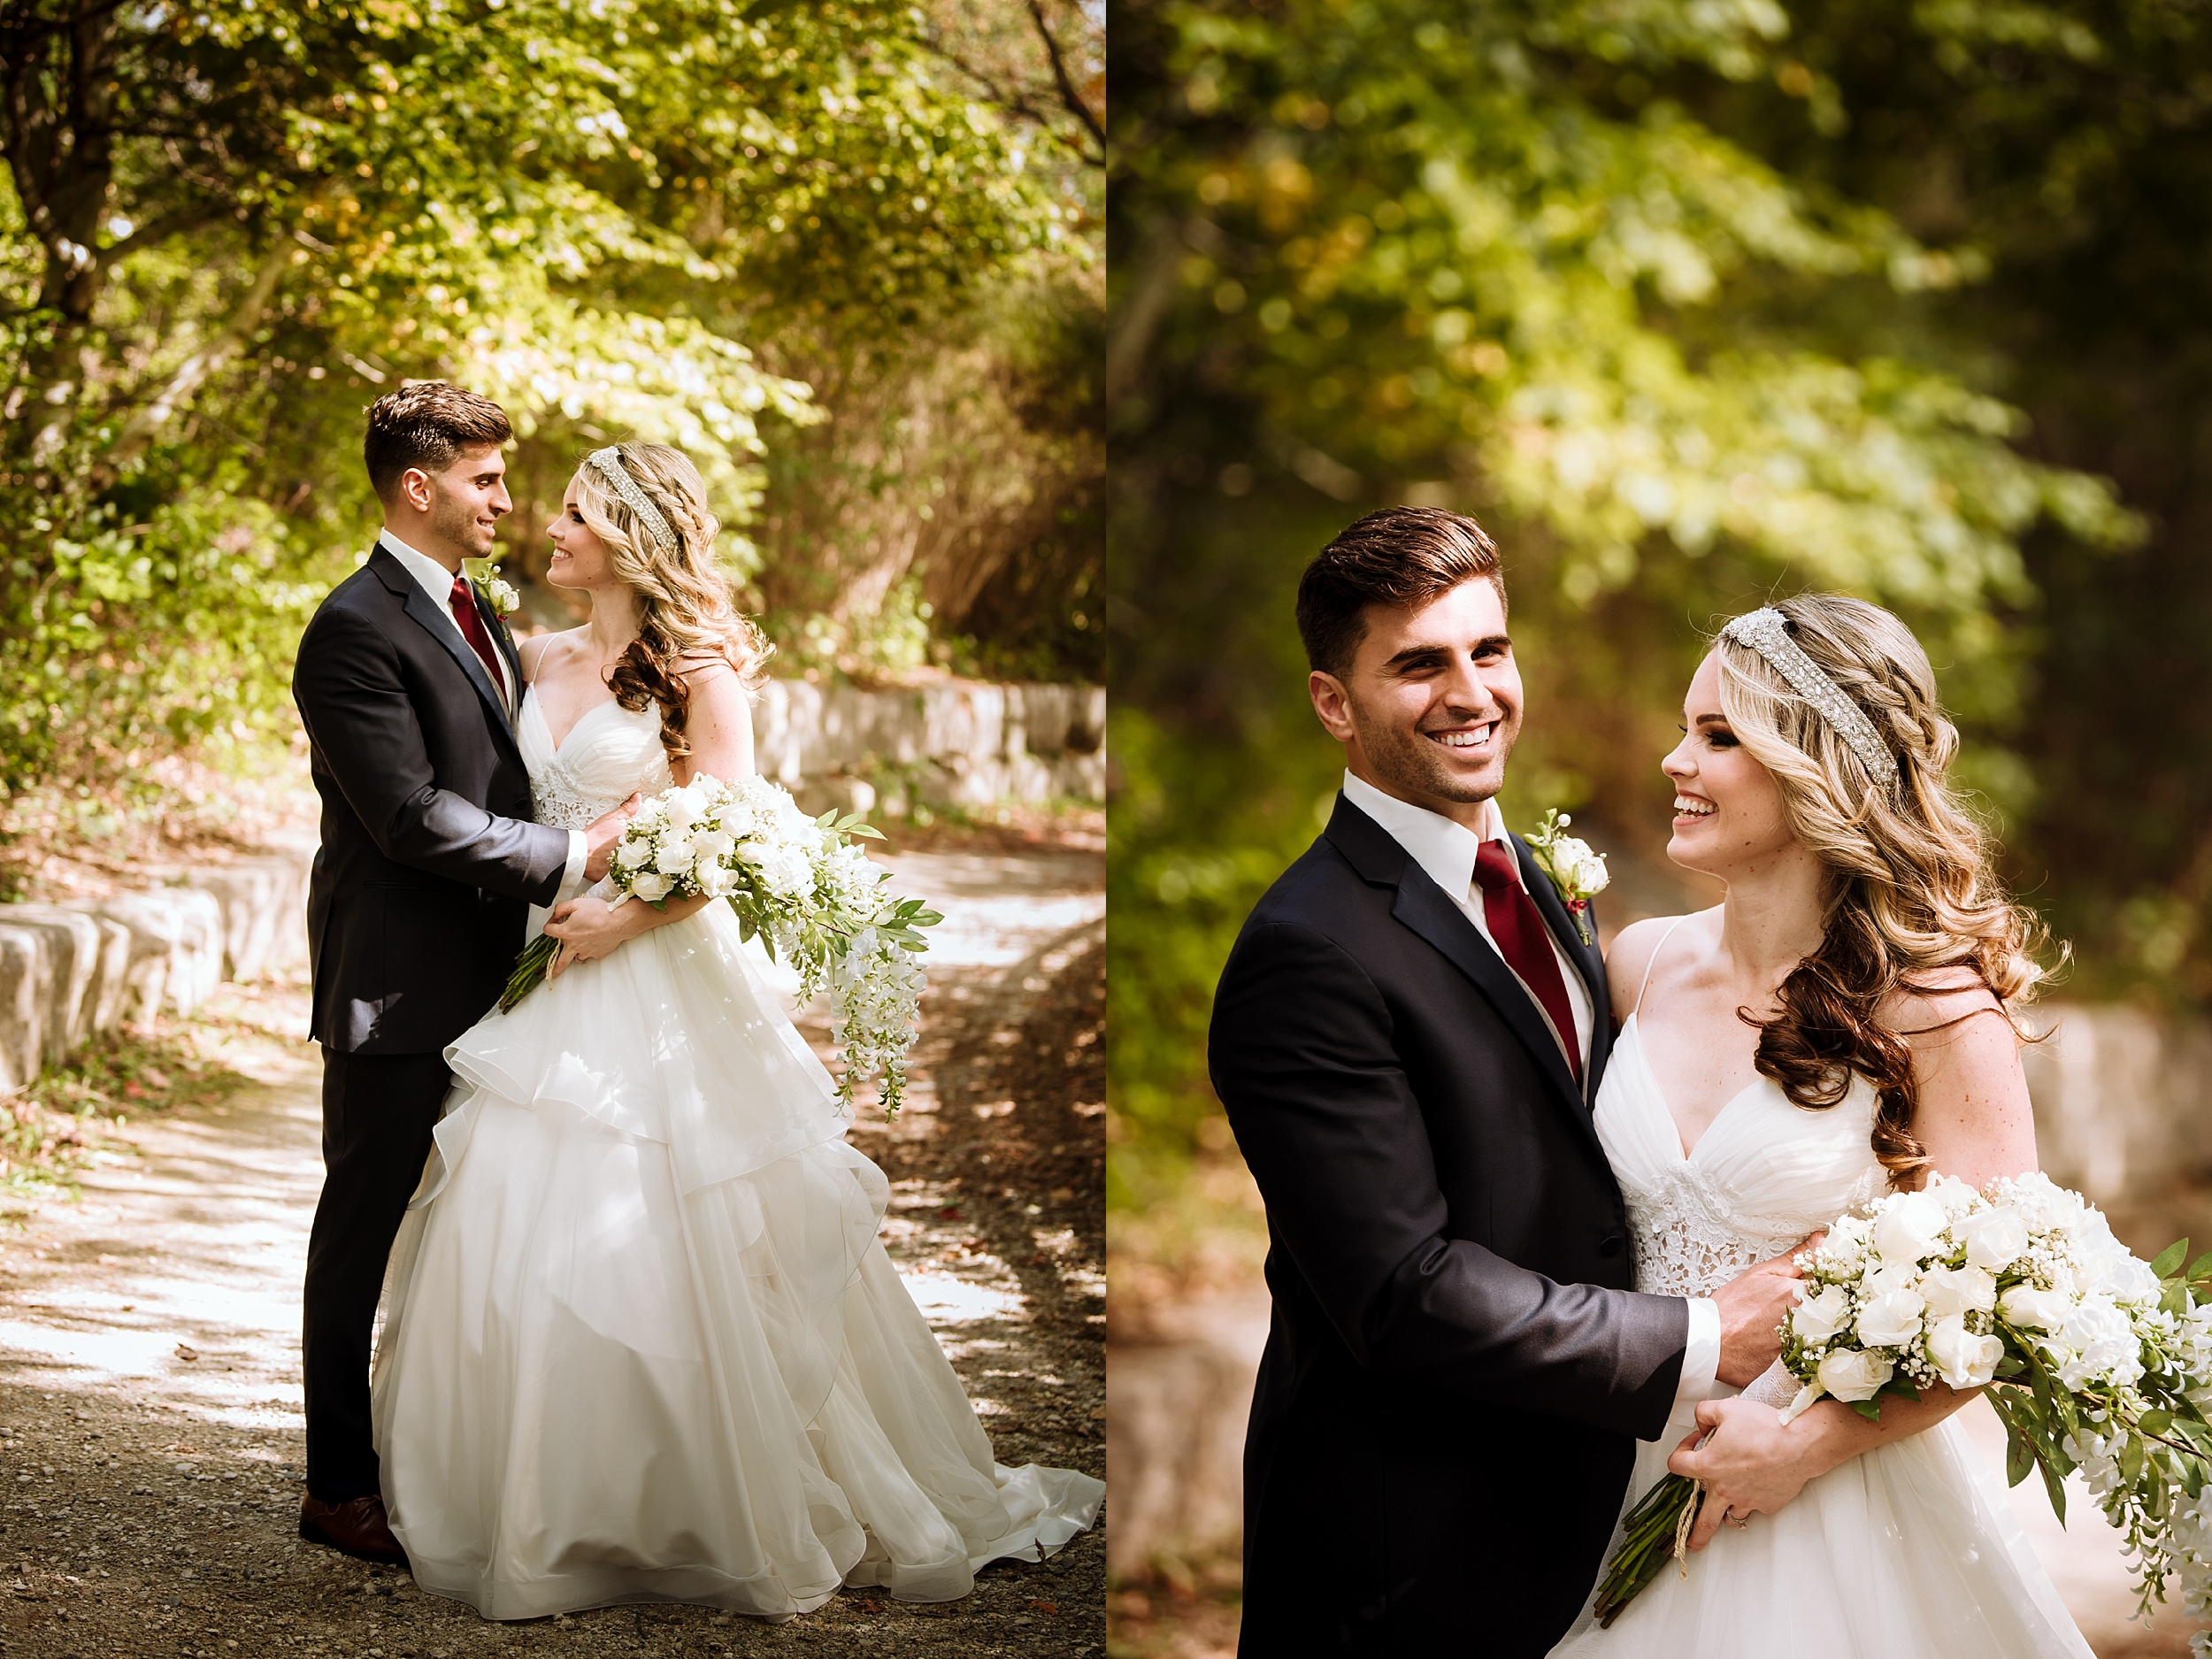 McMichael_Art_Collection_Wedding_chateau_le_jardin_Justine_Munro_Toronto_Photographer014.jpg